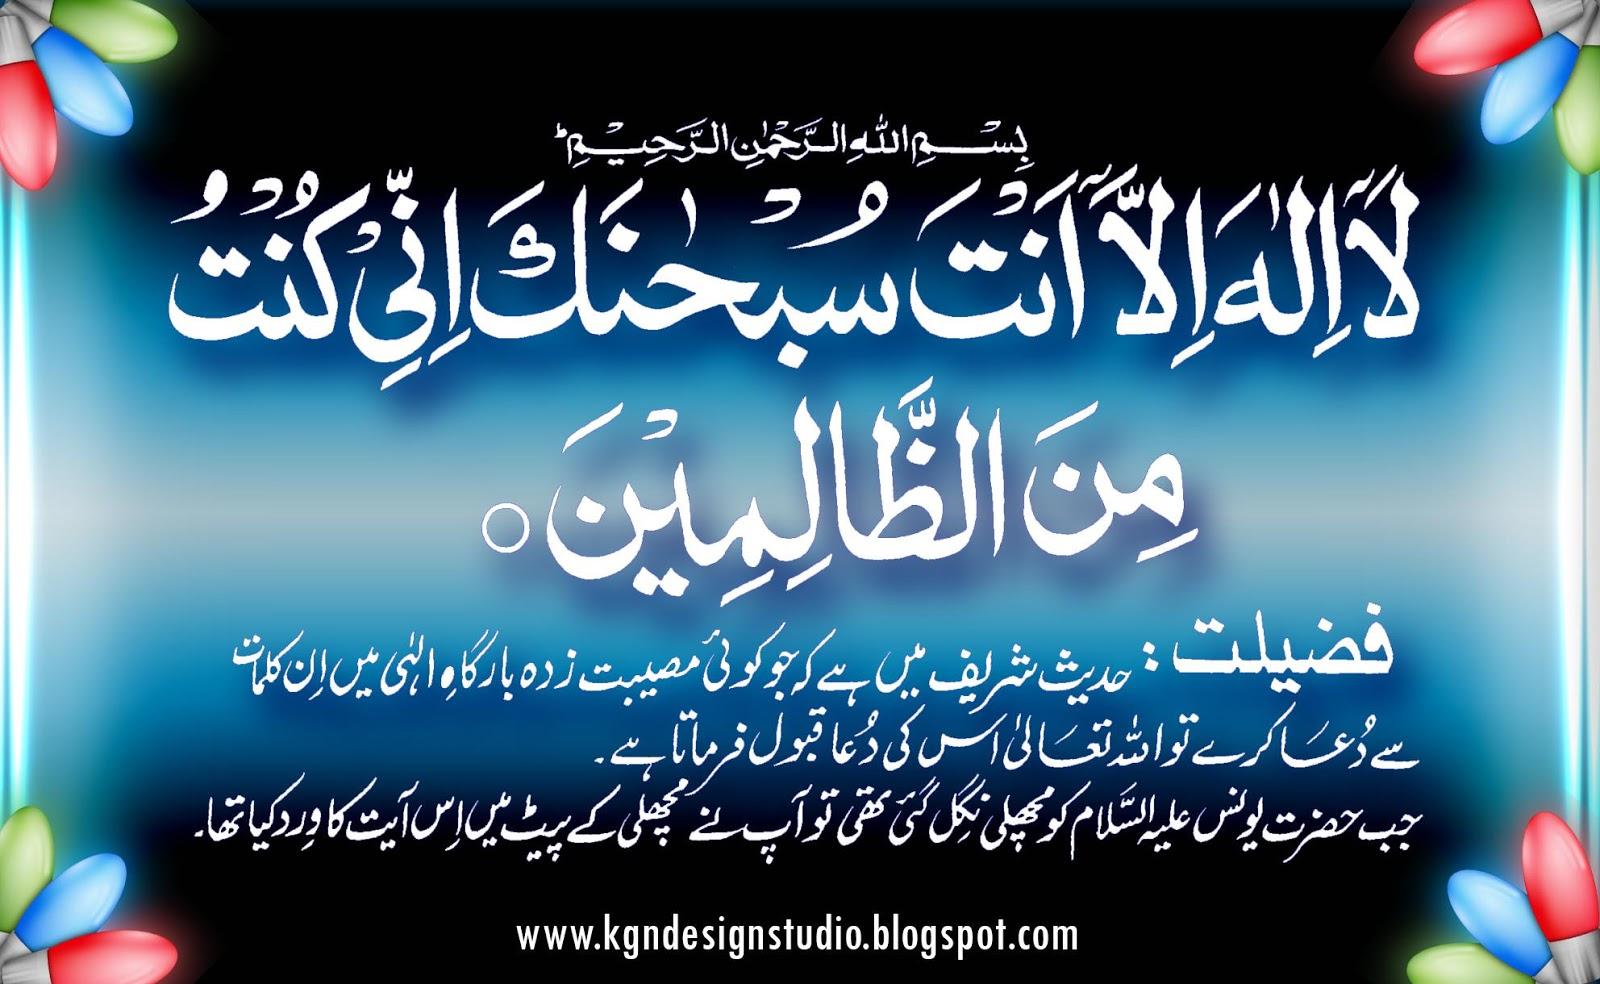 http://1.bp.blogspot.com/-h5Y17W8XkSQ/UO-tNw_yphI/AAAAAAAACjs/Wjm2uEDwQ6U/s1600/Urdu+Hadees-4.jpg